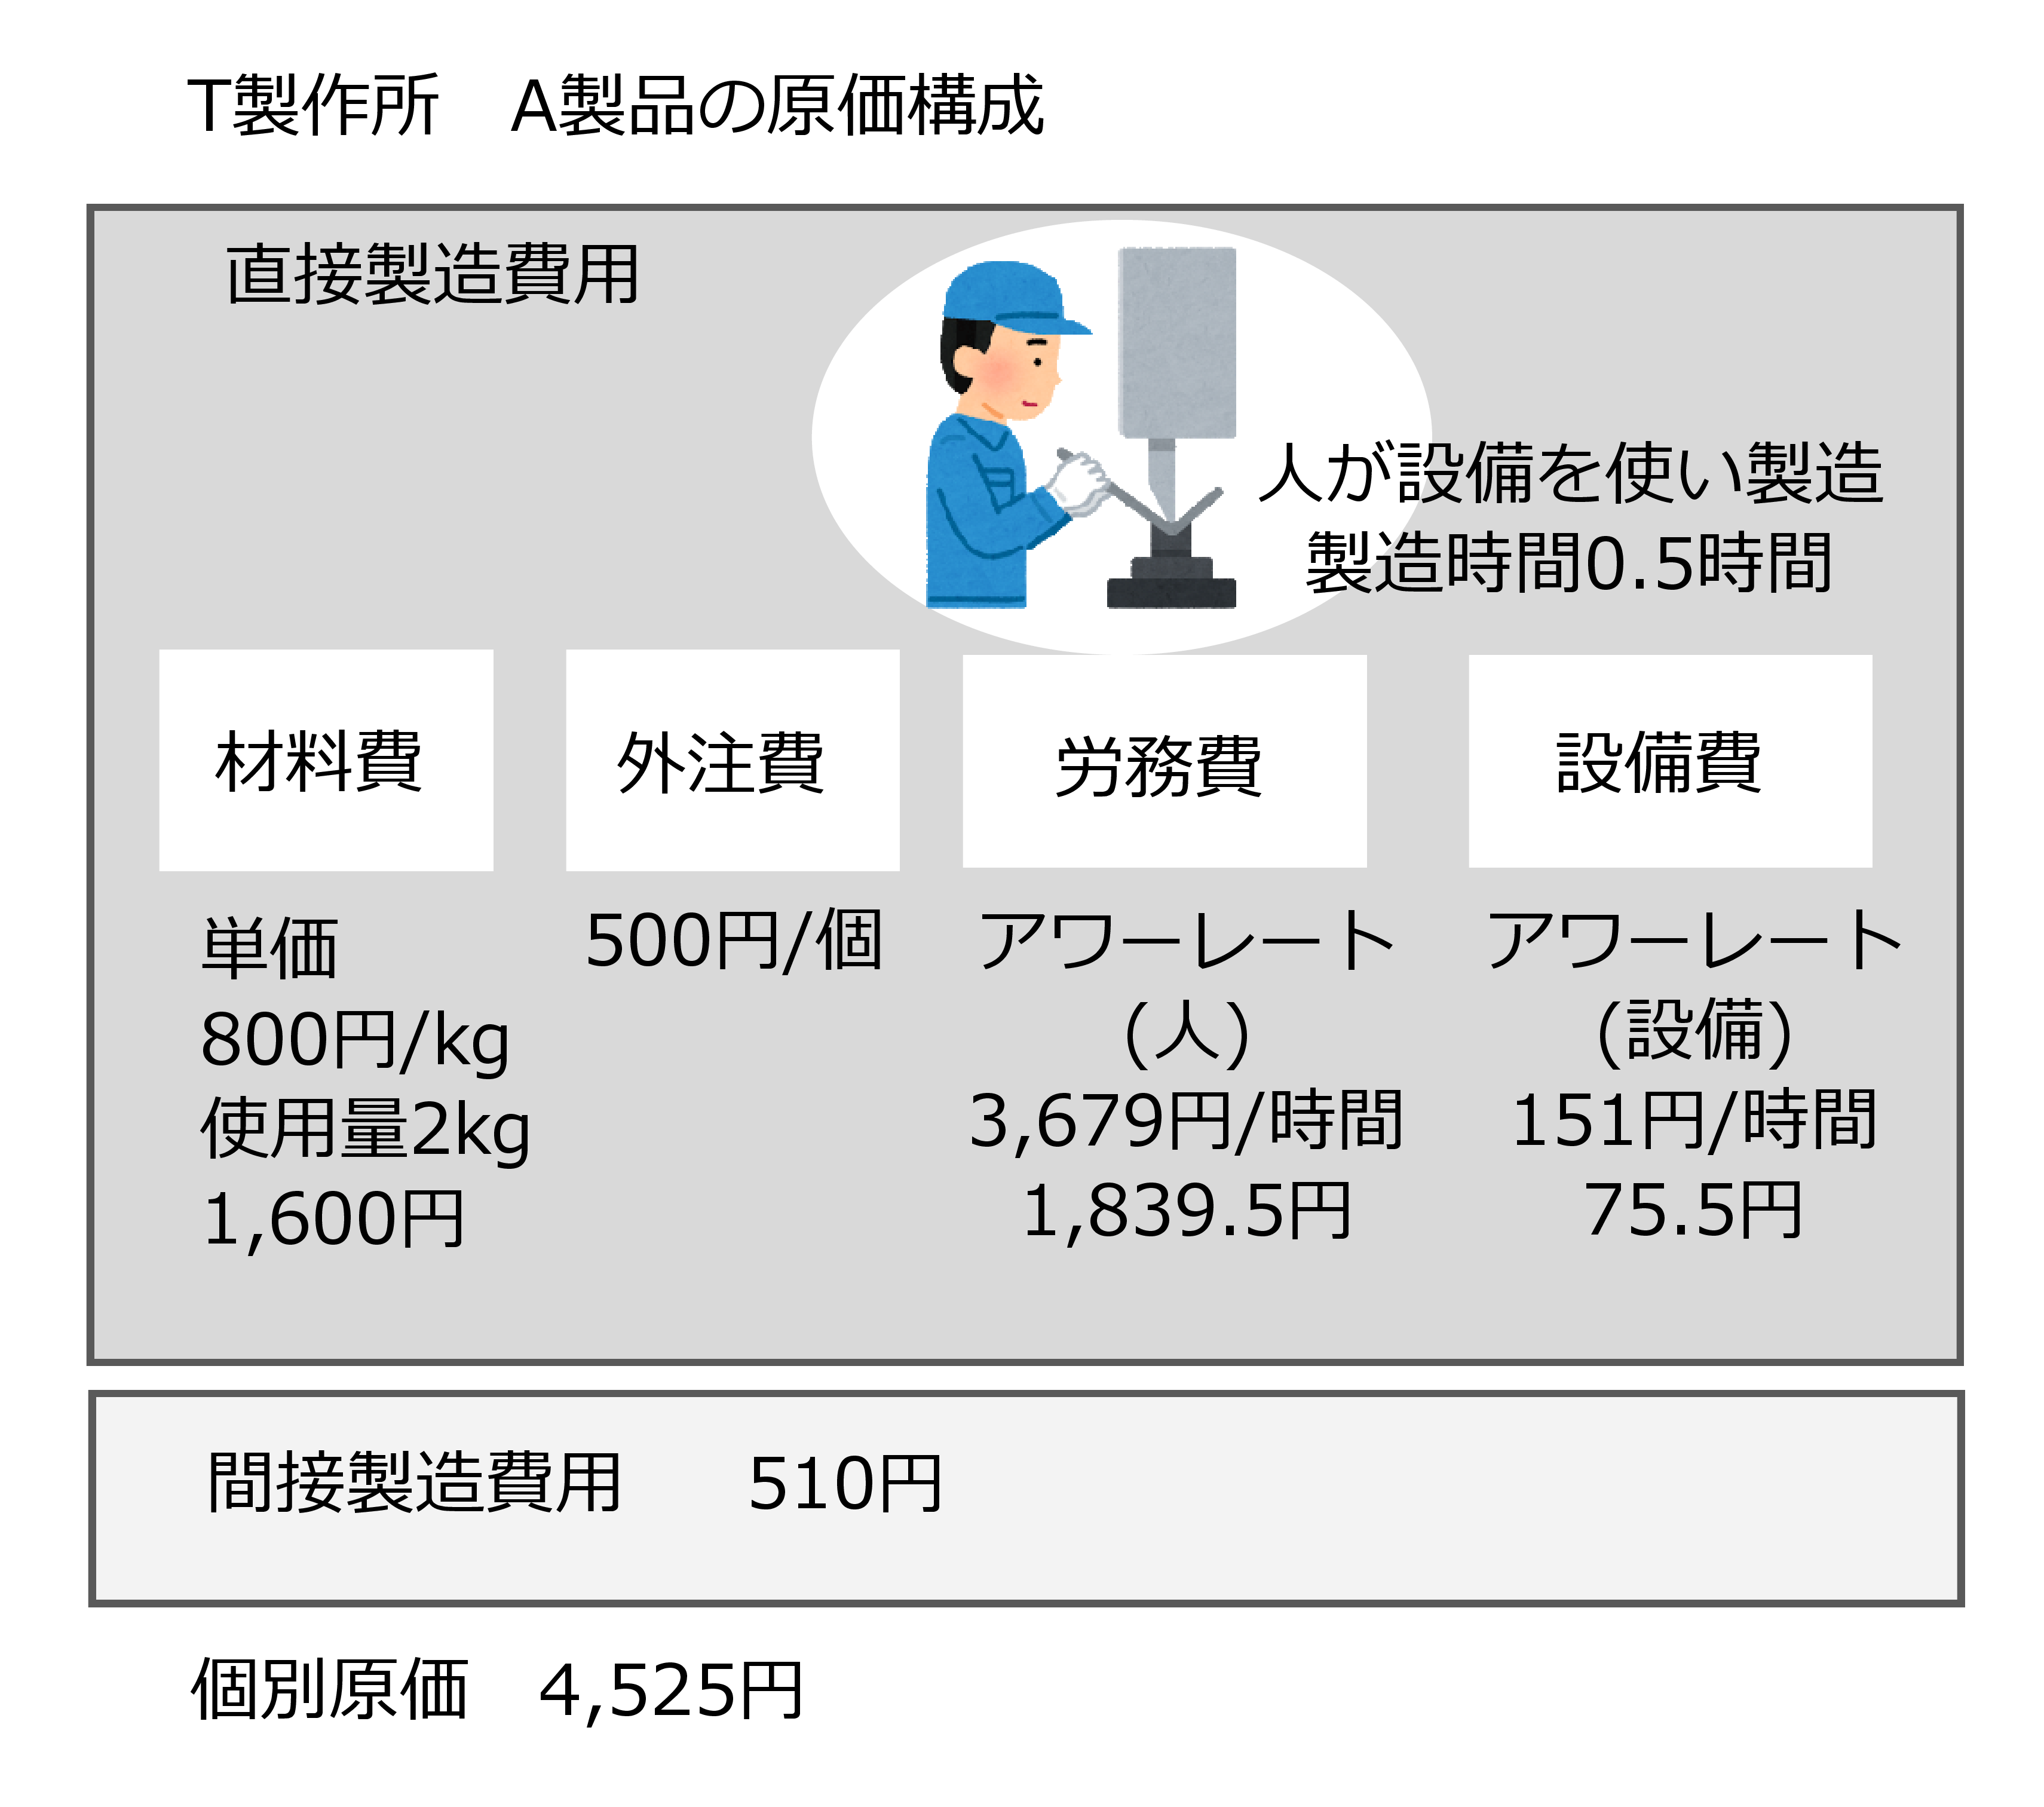 図2-1 製造原価の例(T製作所A製品)